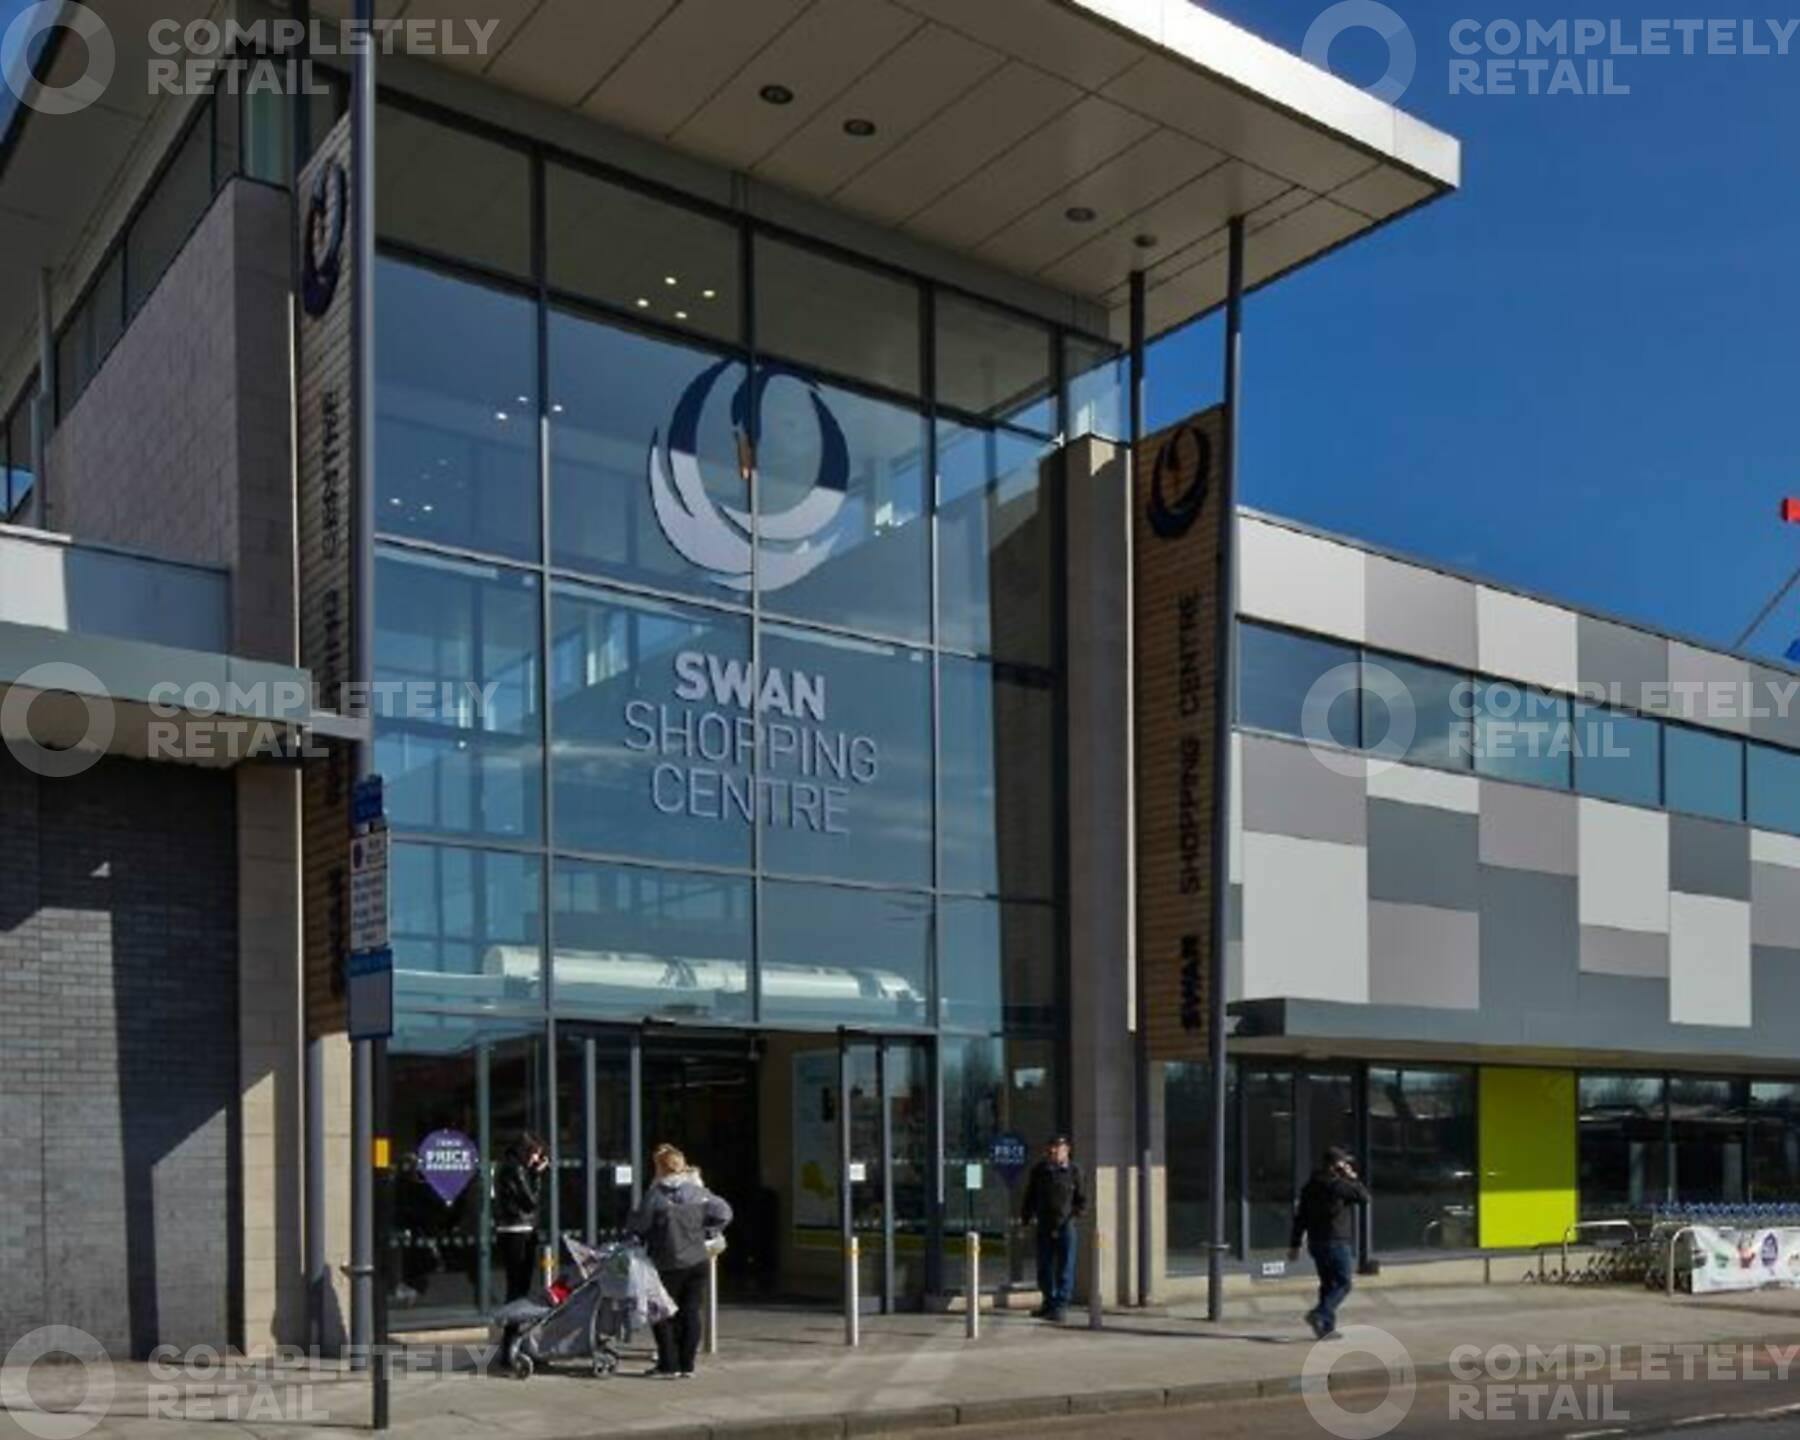 Swan Shopping Centre